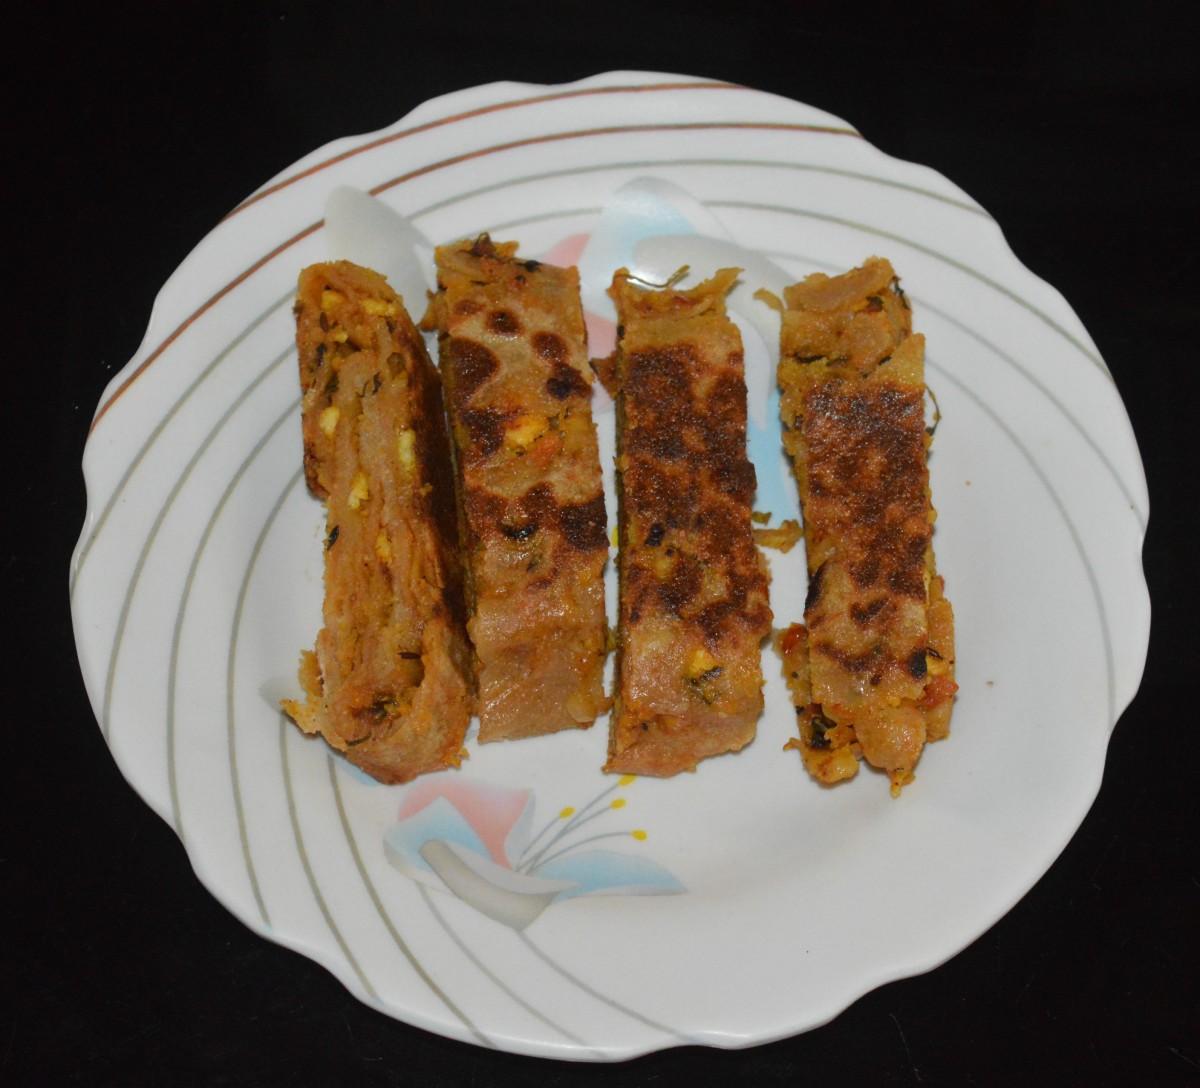 Slice them horizontally at 1-inch intervals.